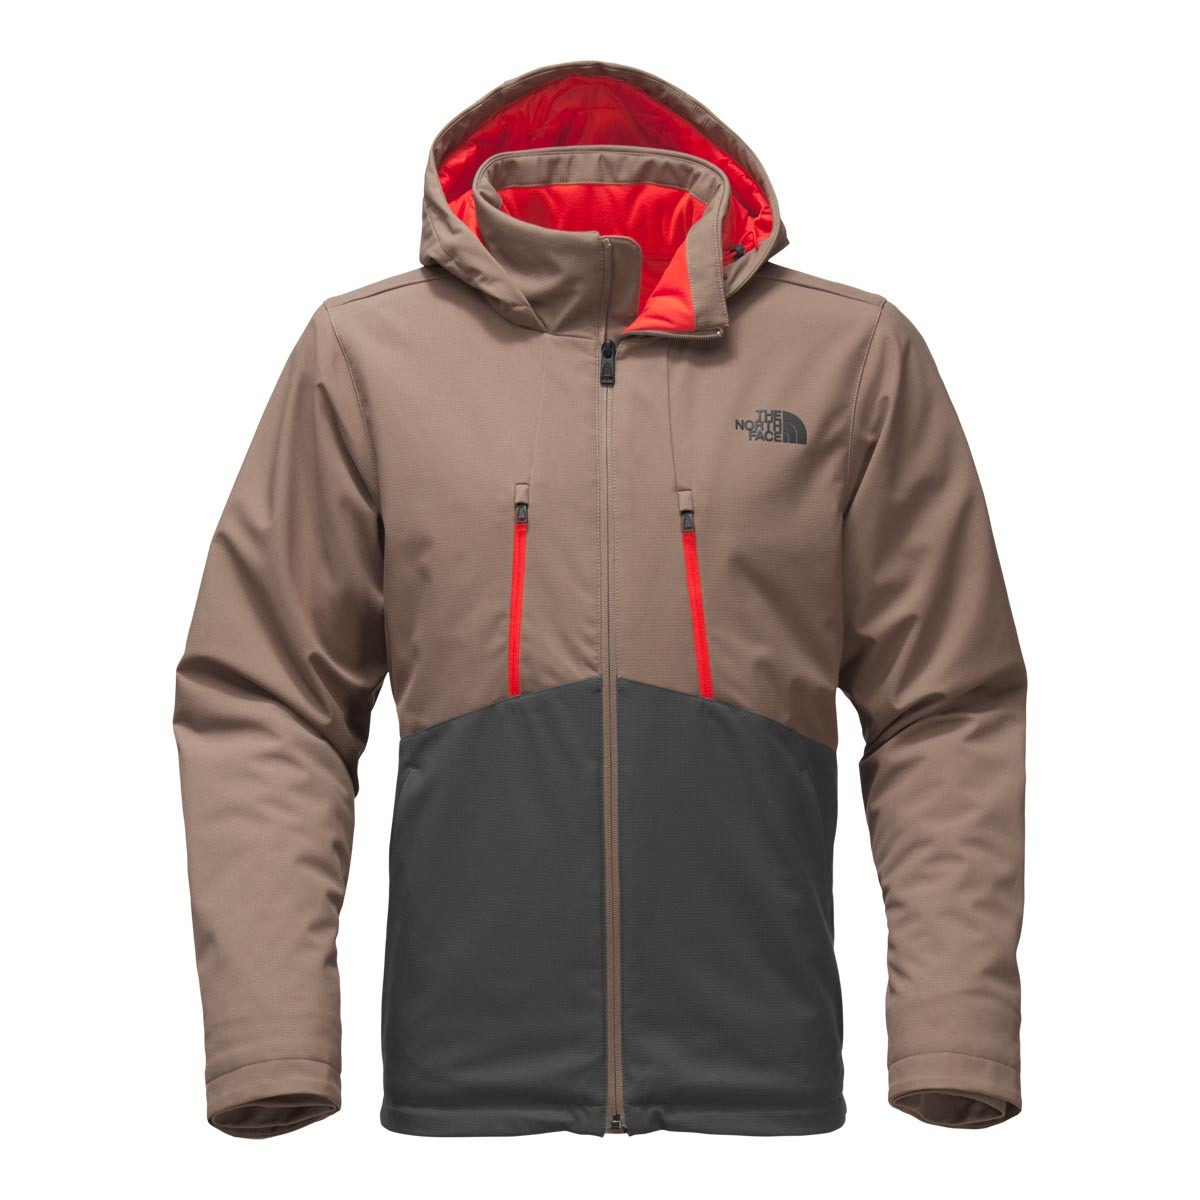 The North Face Men s Apex Elevation Jacket -  198.95 - Thrill On 6f85a1baffa